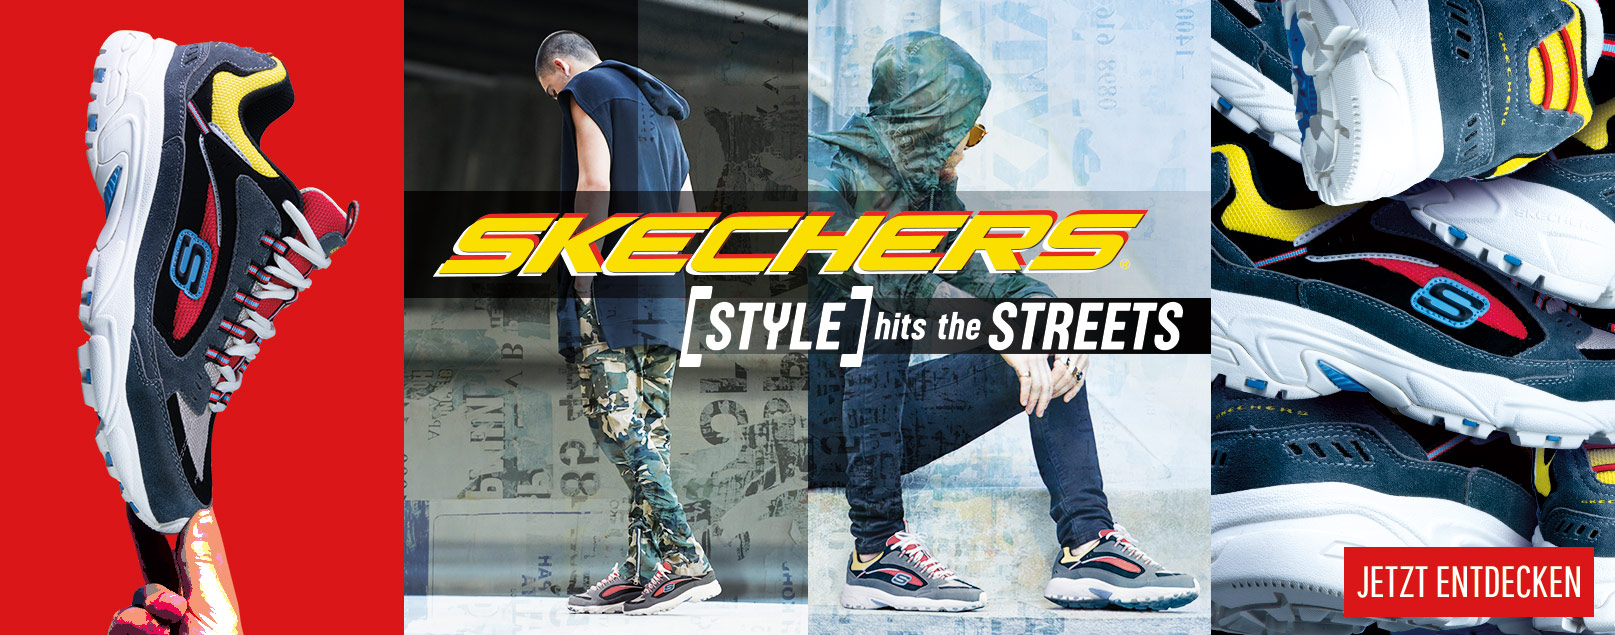 Skechers Streetwear für Herren